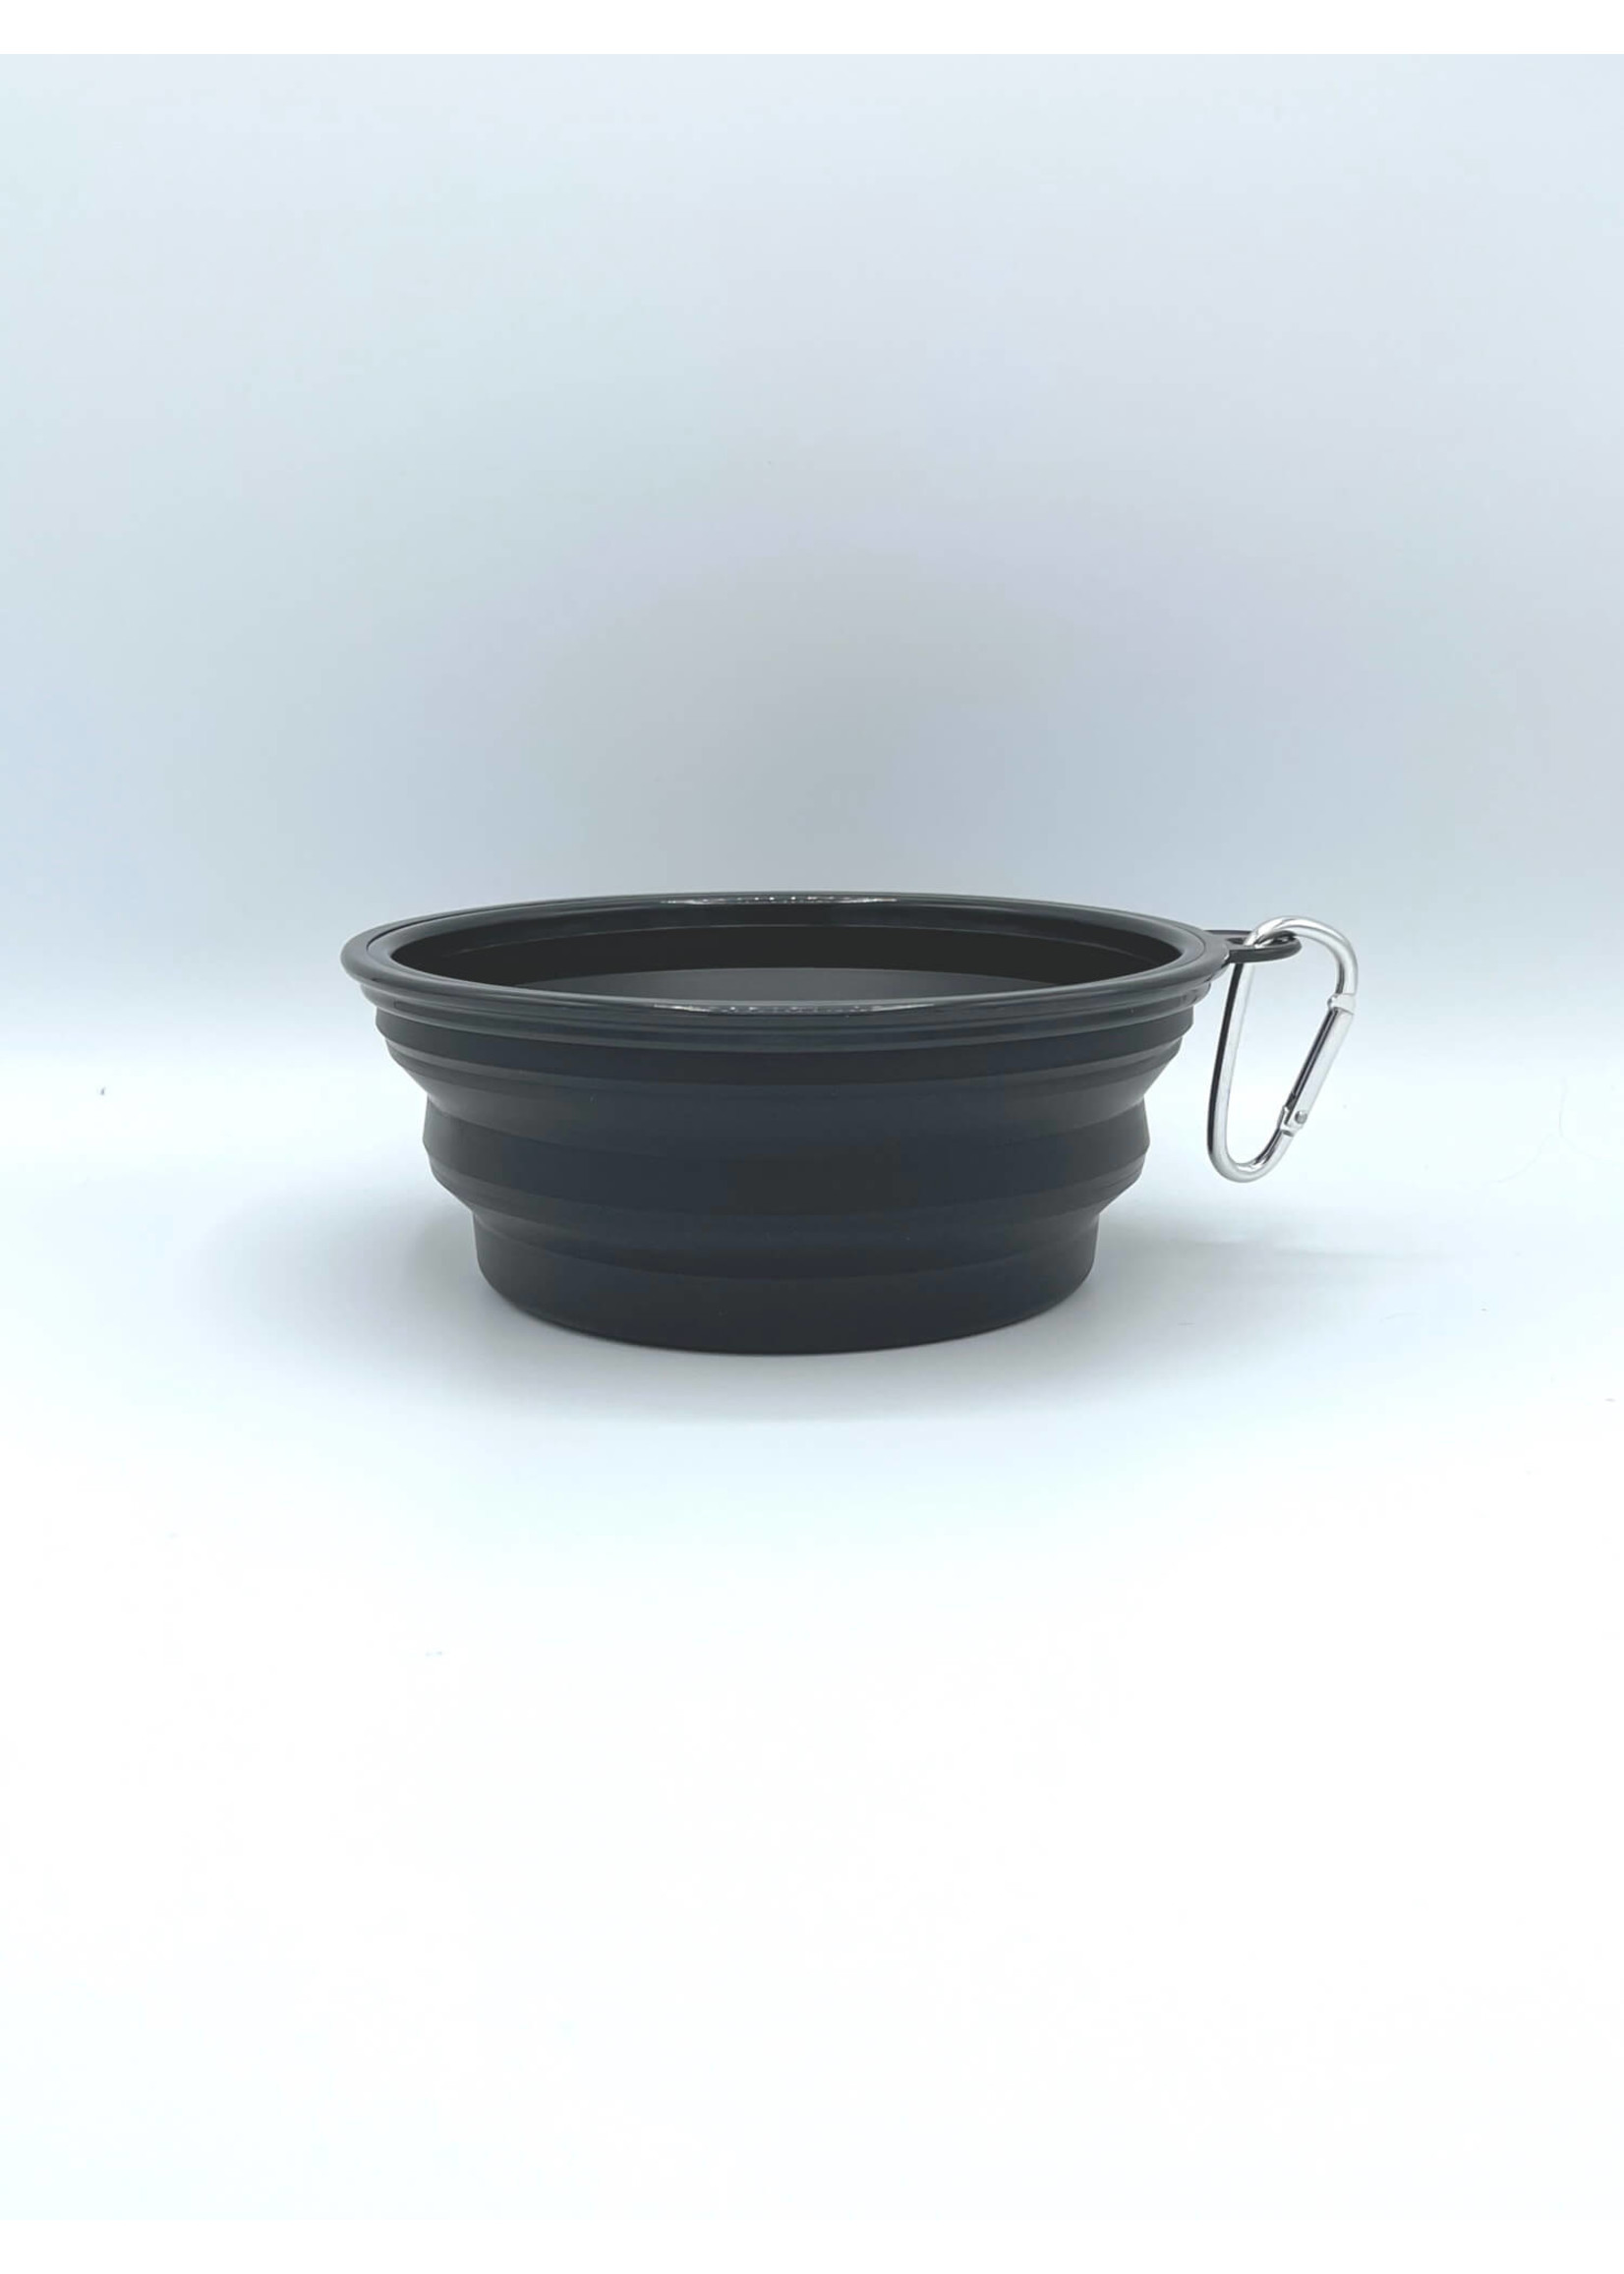 Collapsible Pet Bowl